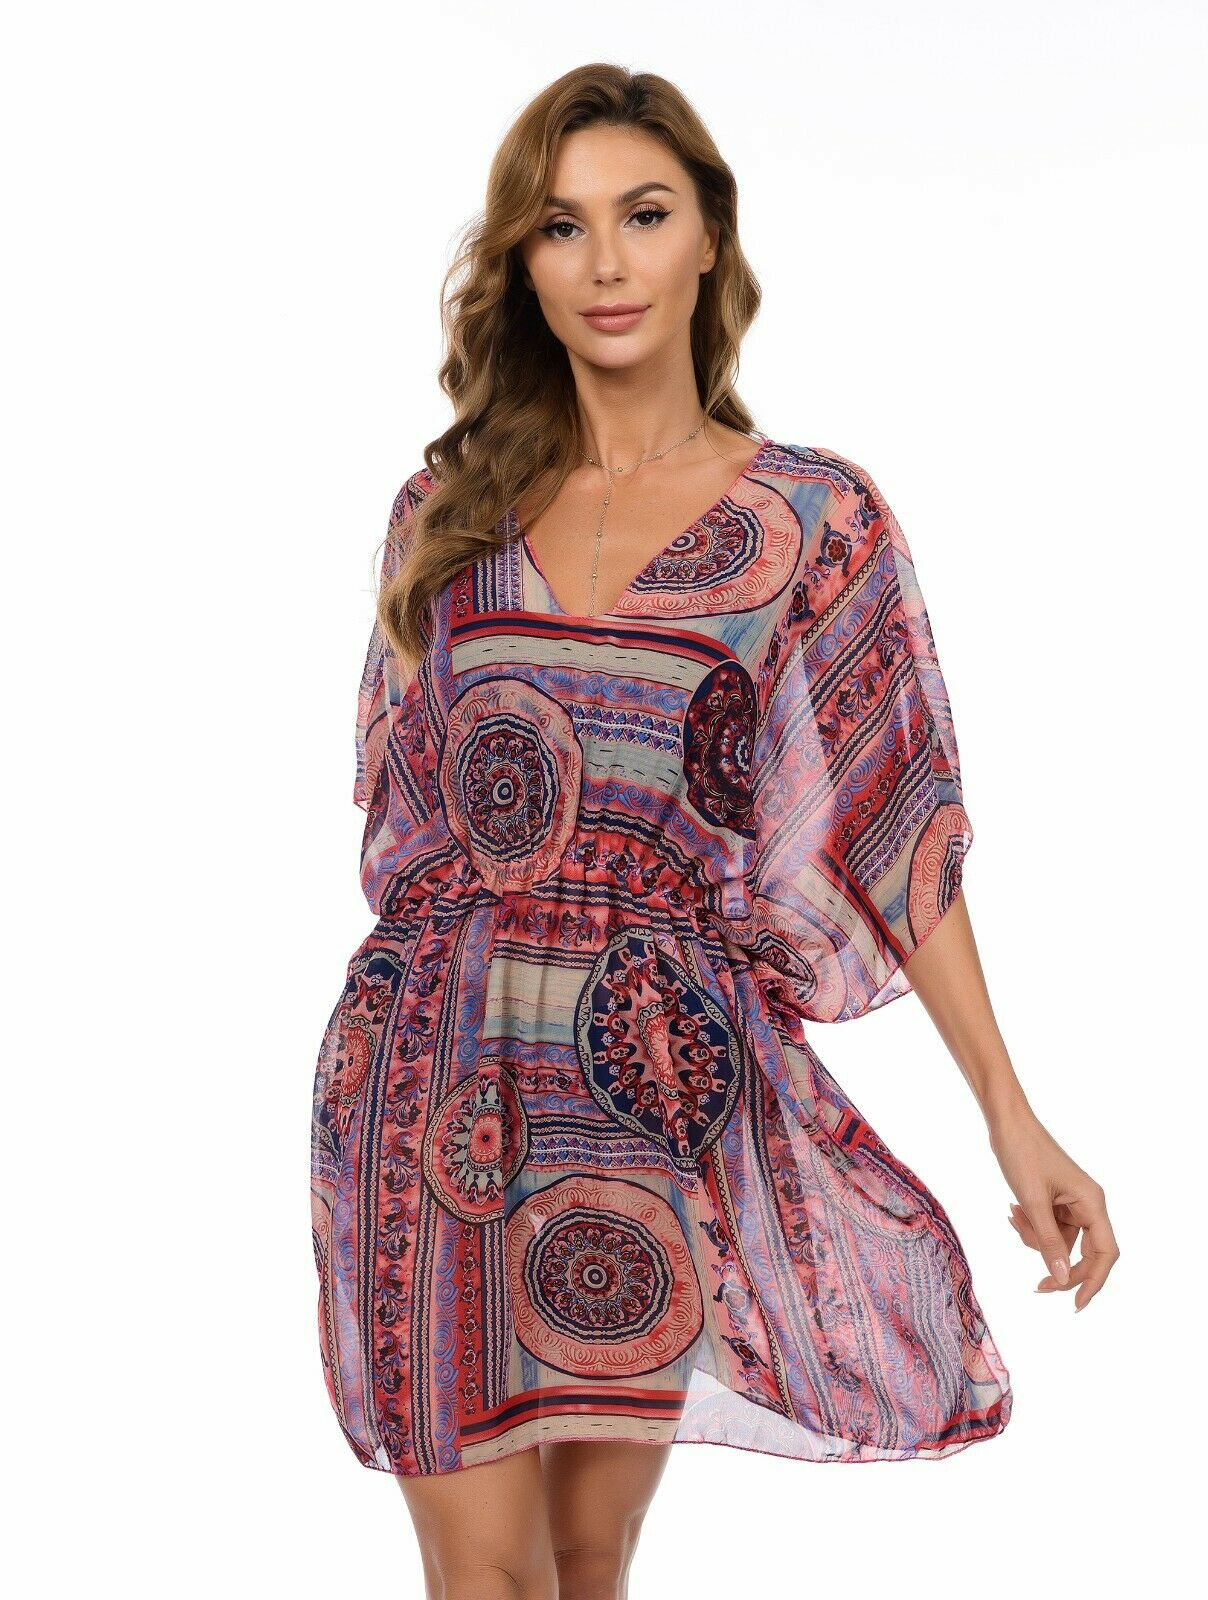 Zentral Chic Chiffon Kaftan Summer Kleid Strandbedeckung Kleider Power UK Seller